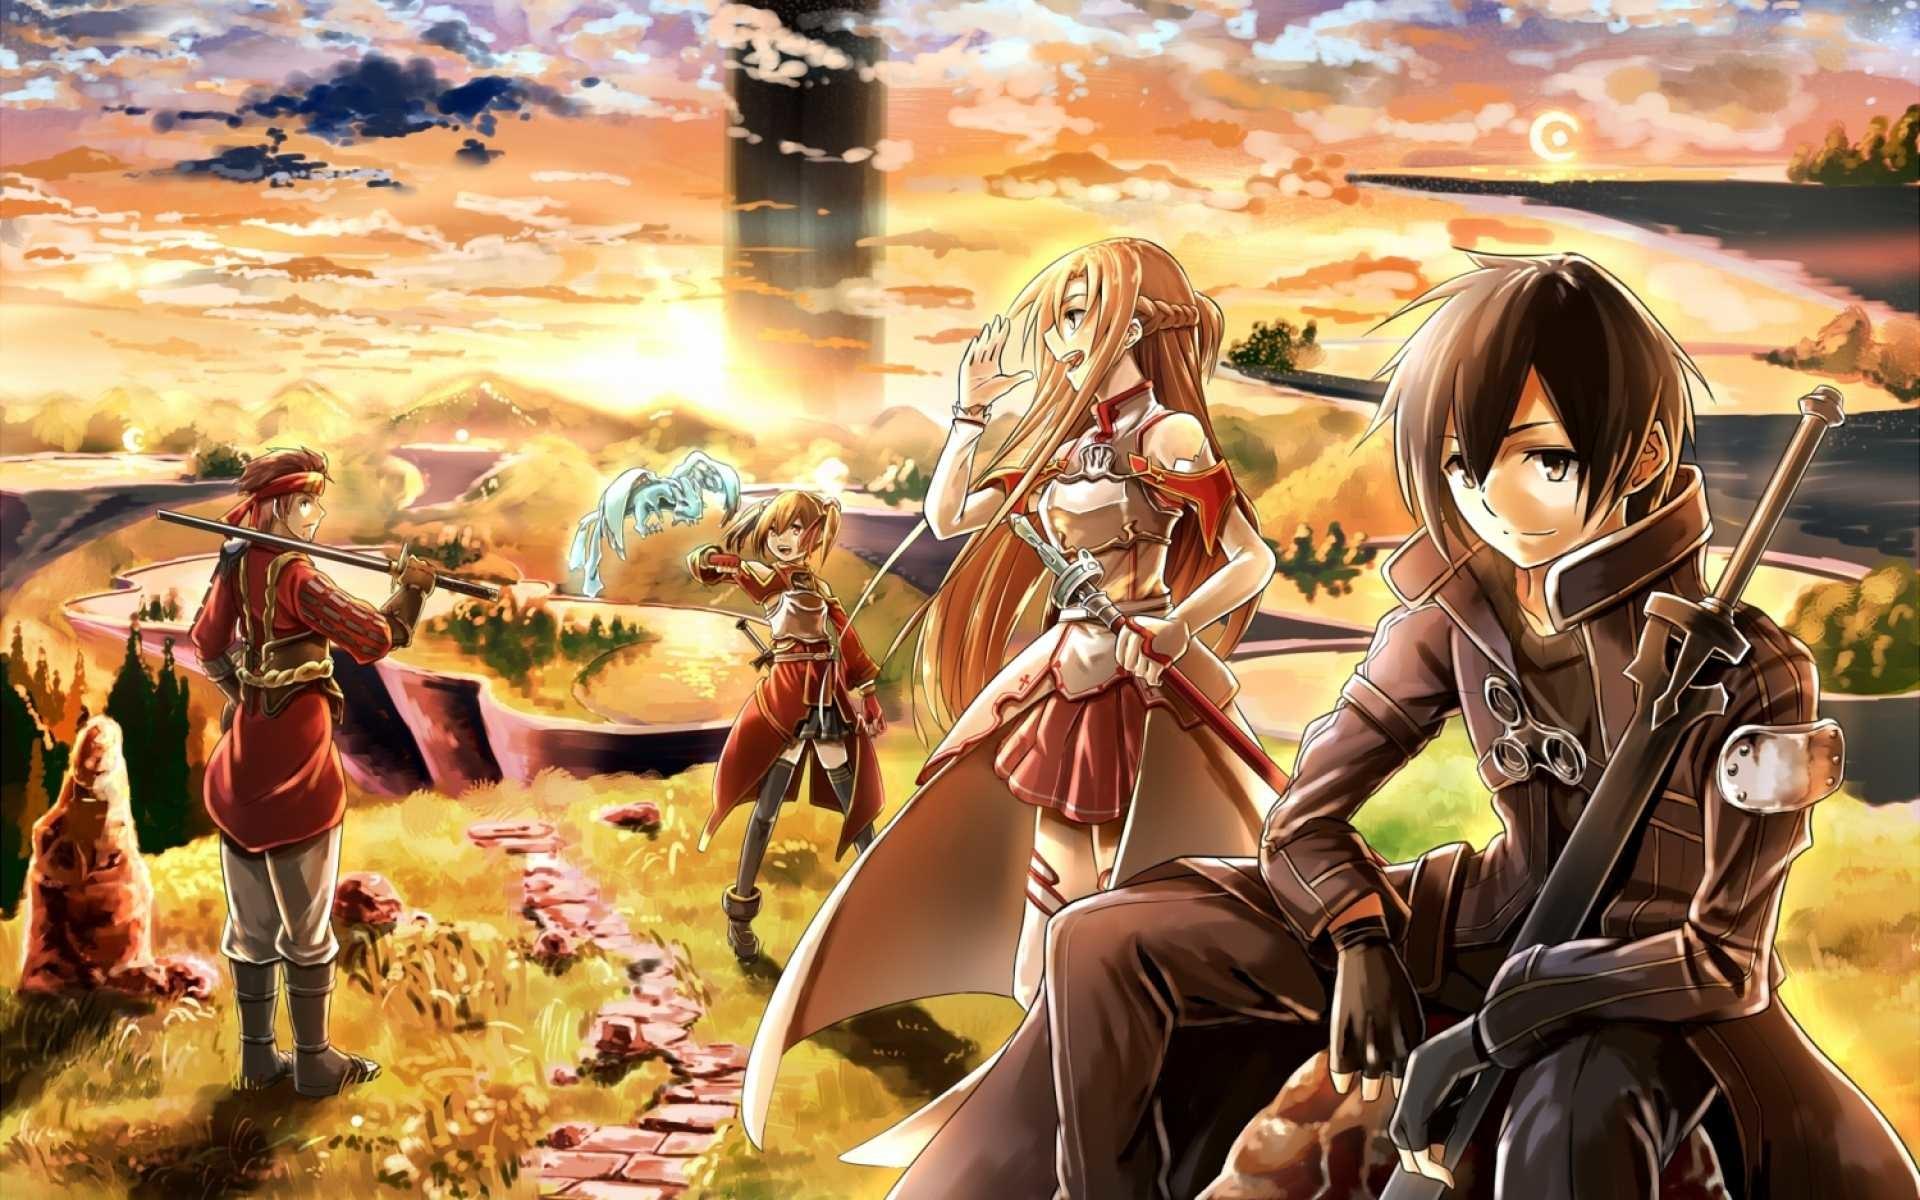 Sword Art Online Wallpaper & Sao Wallpaper Best Collection